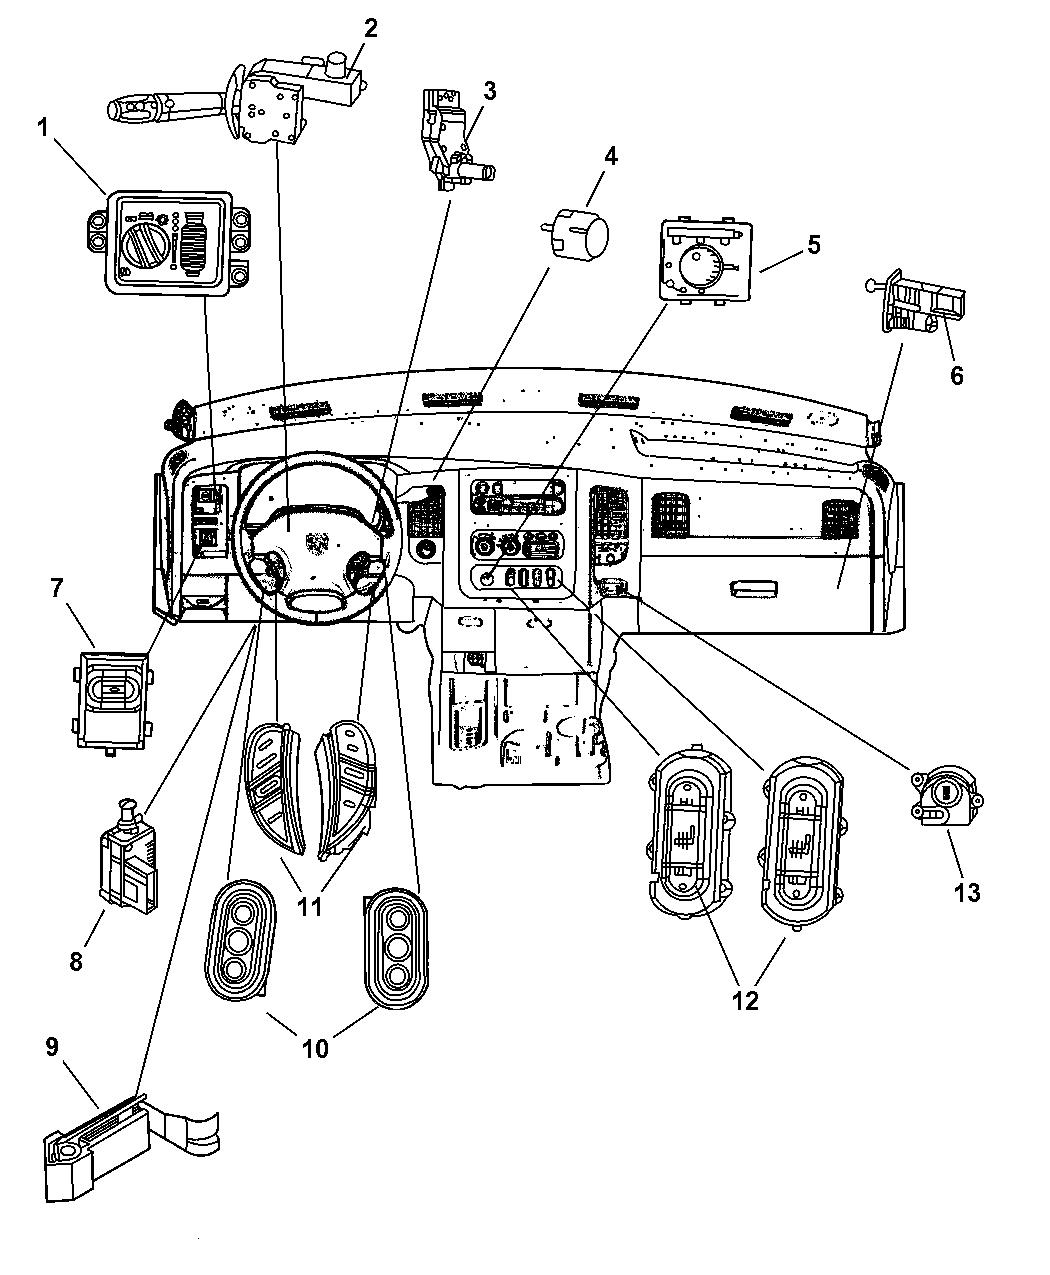 2001 Dodge Ram 1500 Radio Wiring Diagram View Diagram 2001 Dodge Ram